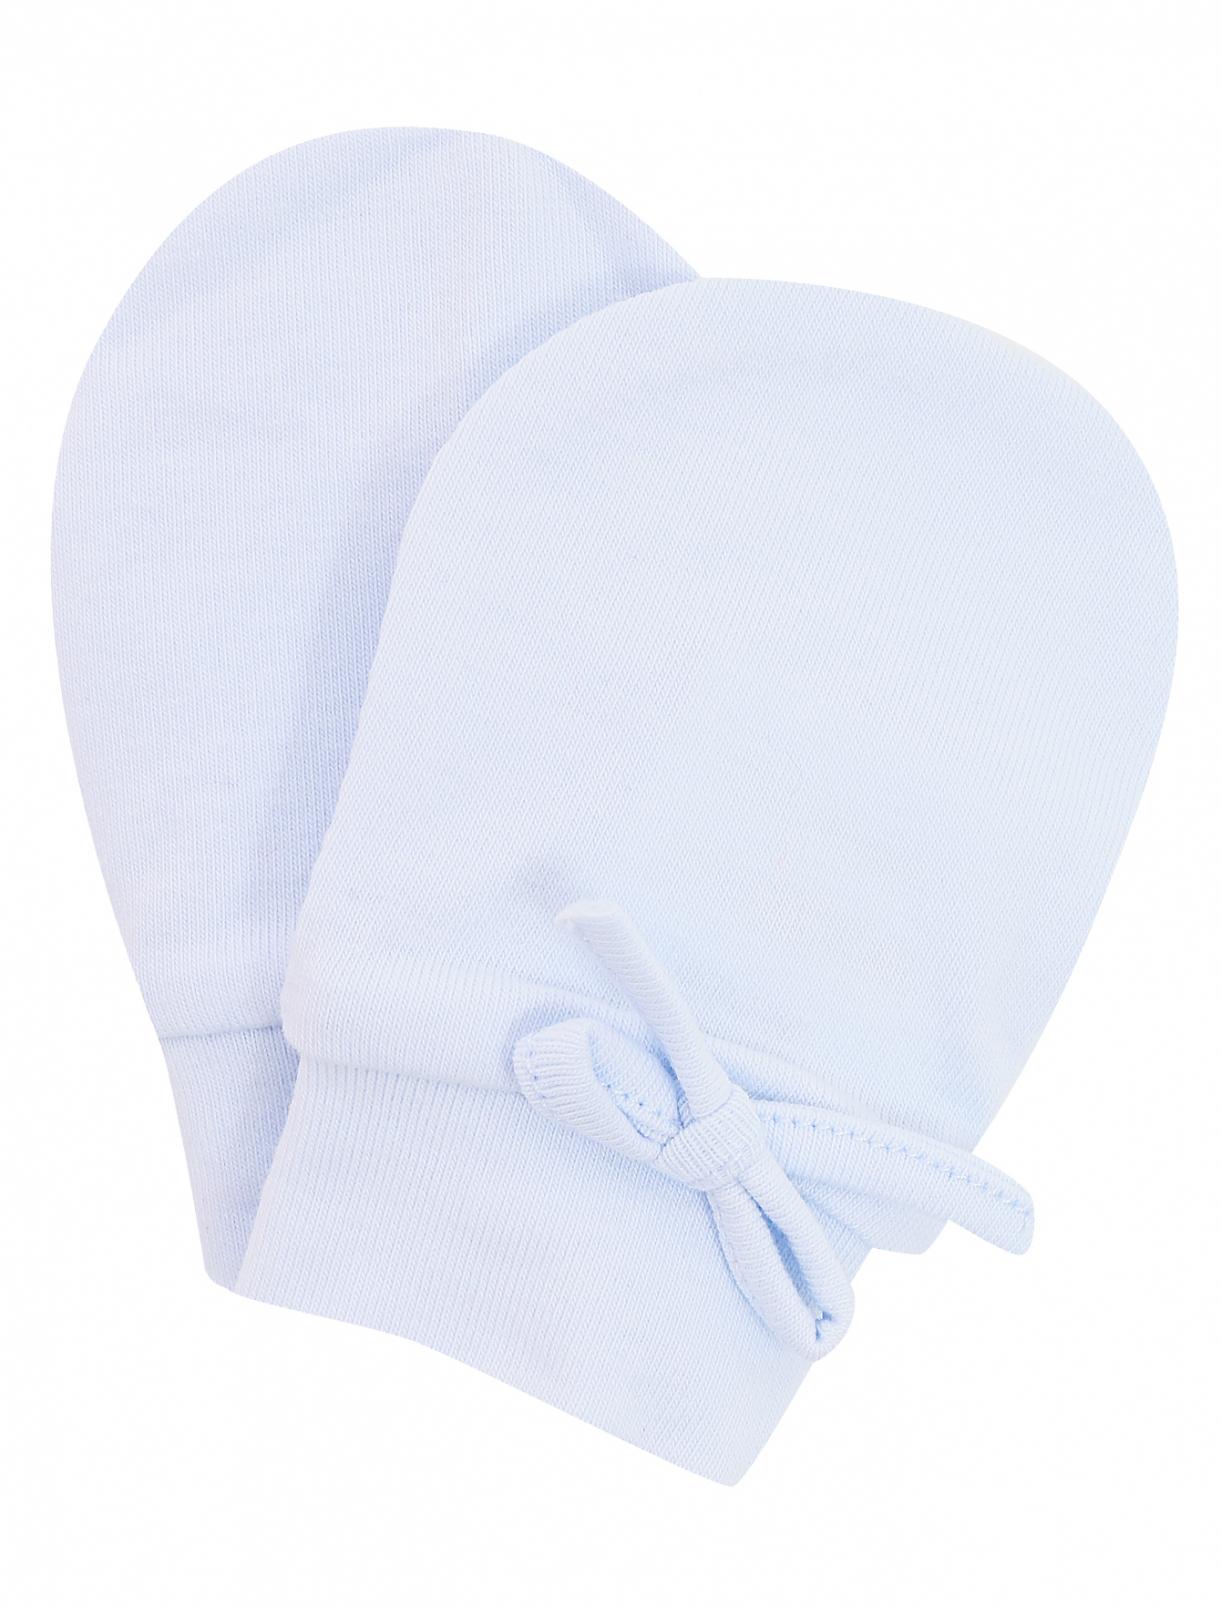 Рукавички-царапки из хлопка Nanan  –  Общий вид